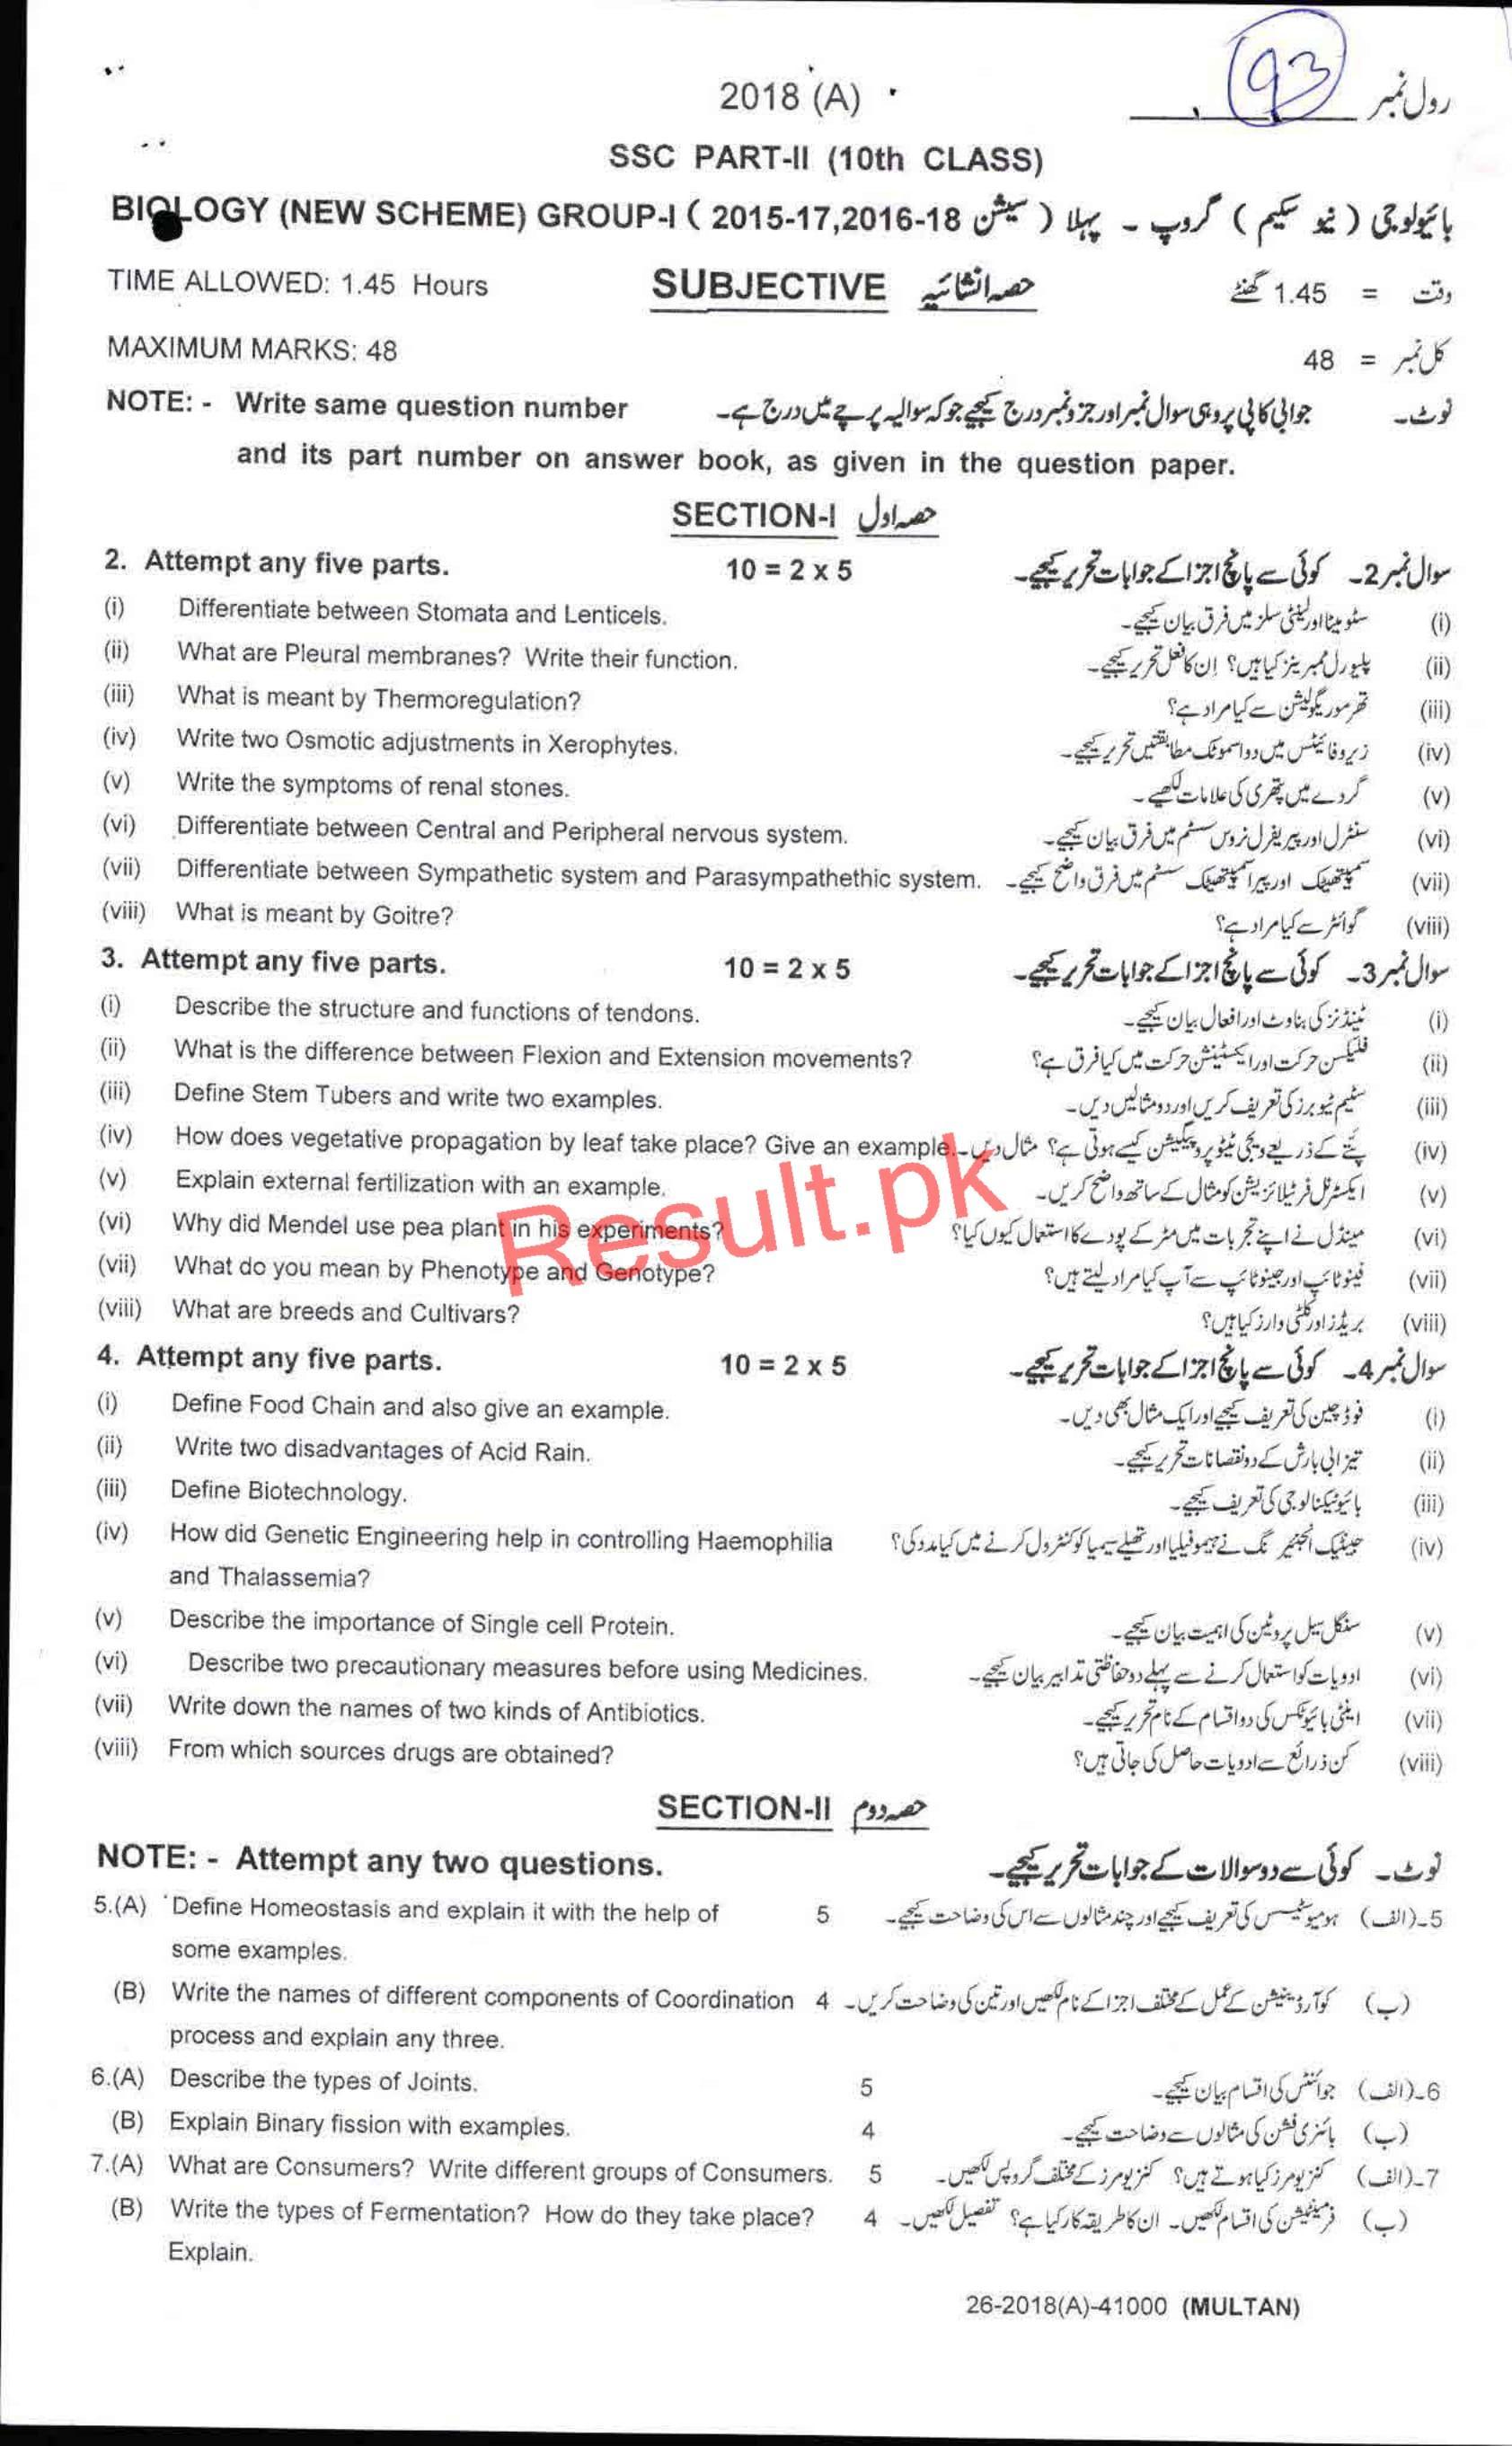 BISE Multan Board Past Papers 2019 Matric, SSC Part 1 & 2